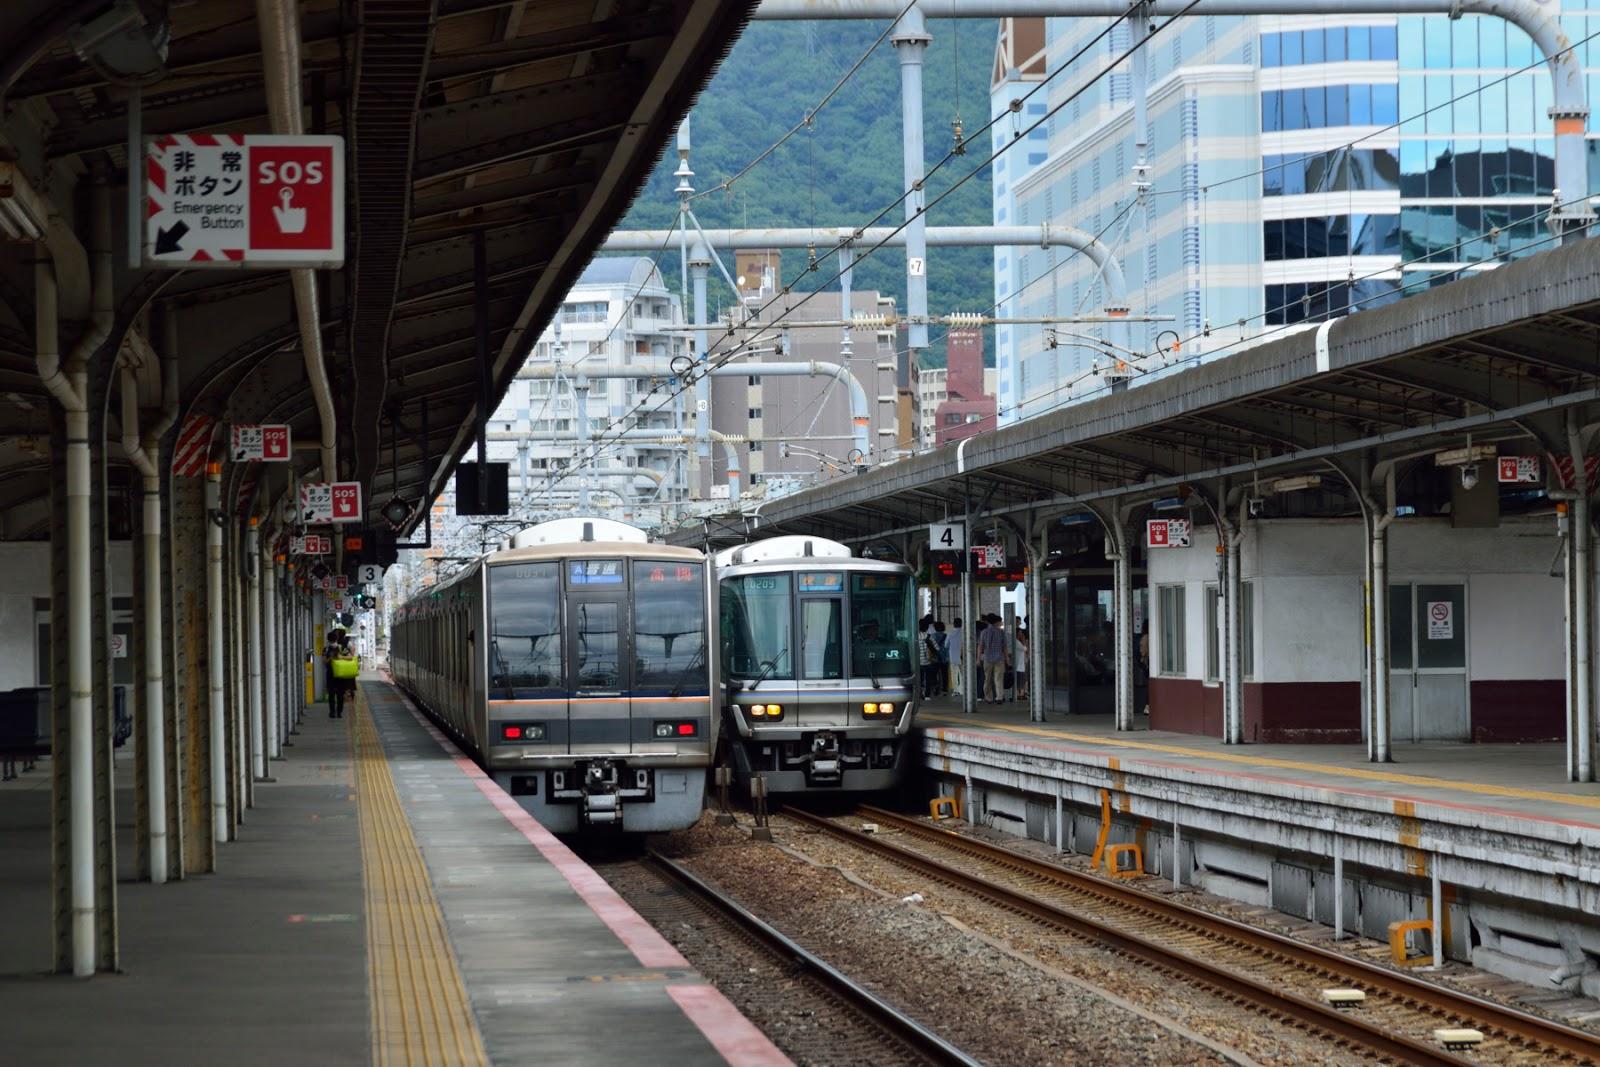 Tokiwai's Photo Blog: 東海道本線 神戸駅